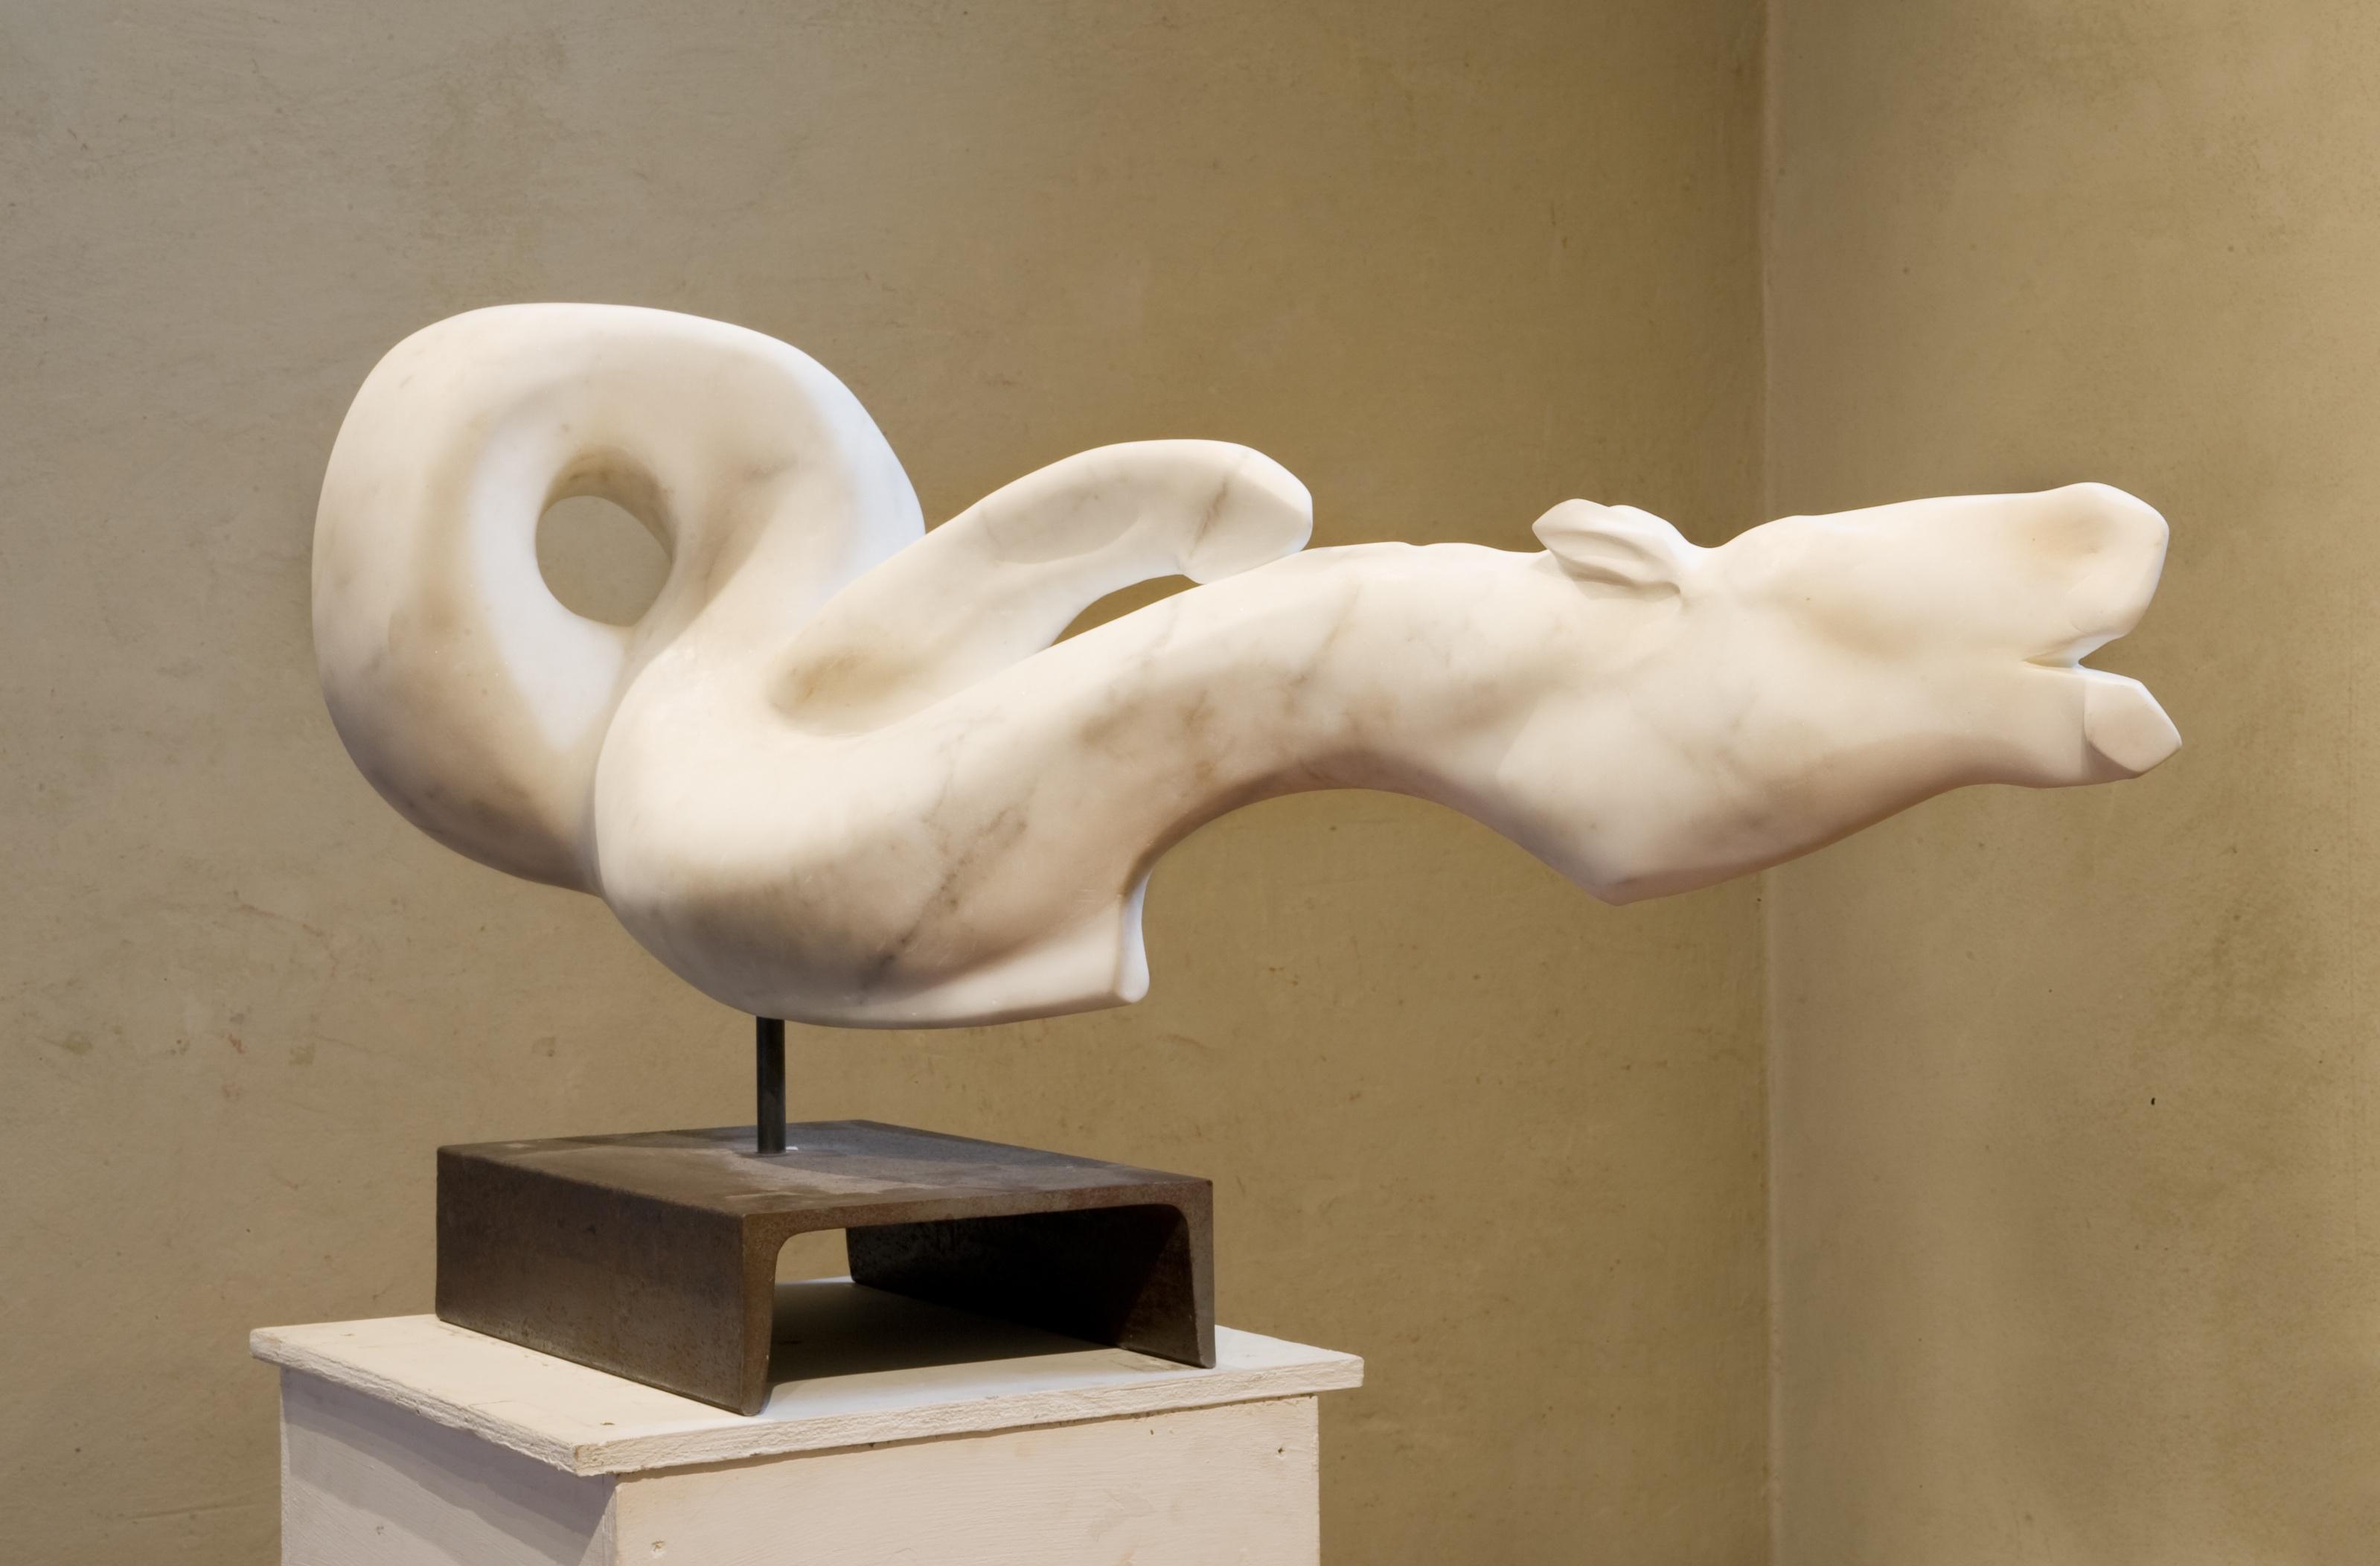 Cavallino, 2008, marmo statuario di Carrara, cm 52 x 110 x 52